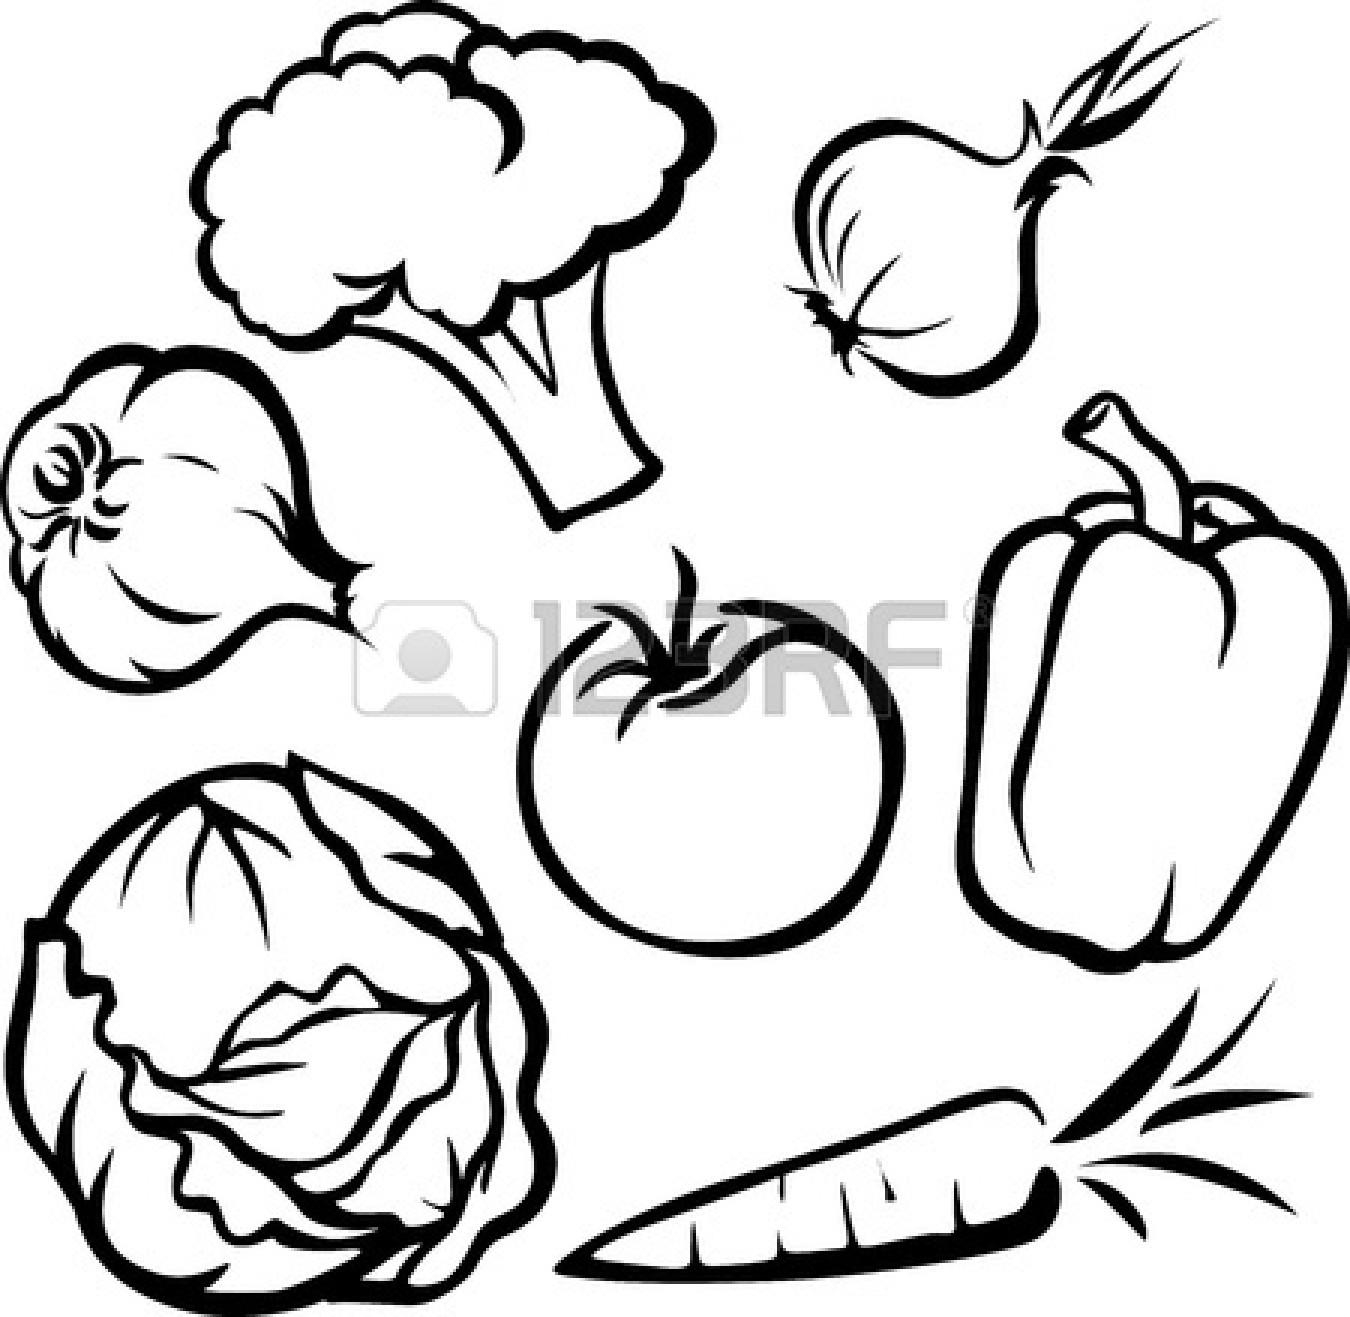 Vegetables clipart outline. Black and white panda